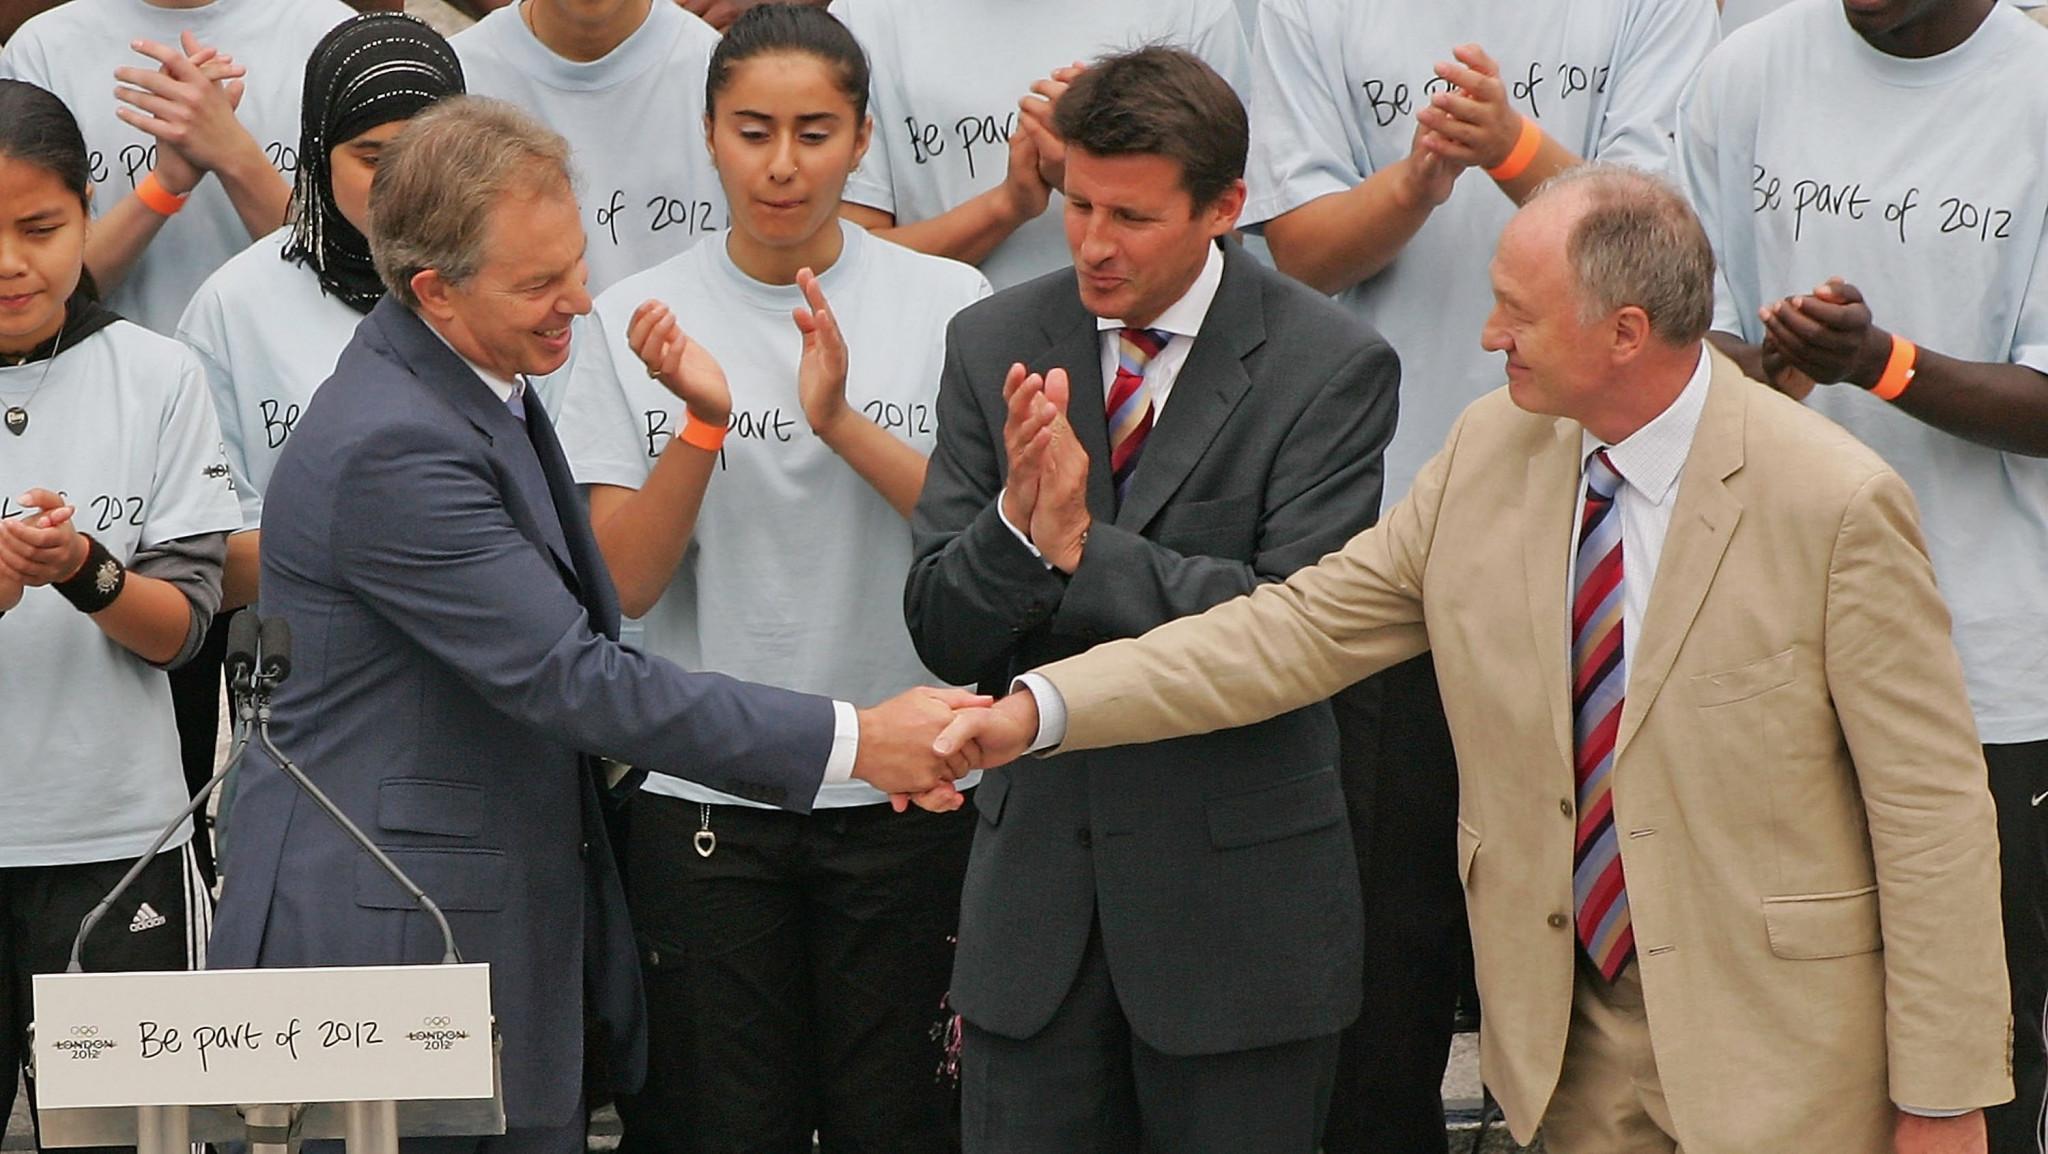 London 2012 legacy discussed as bid team members reunited for radio show